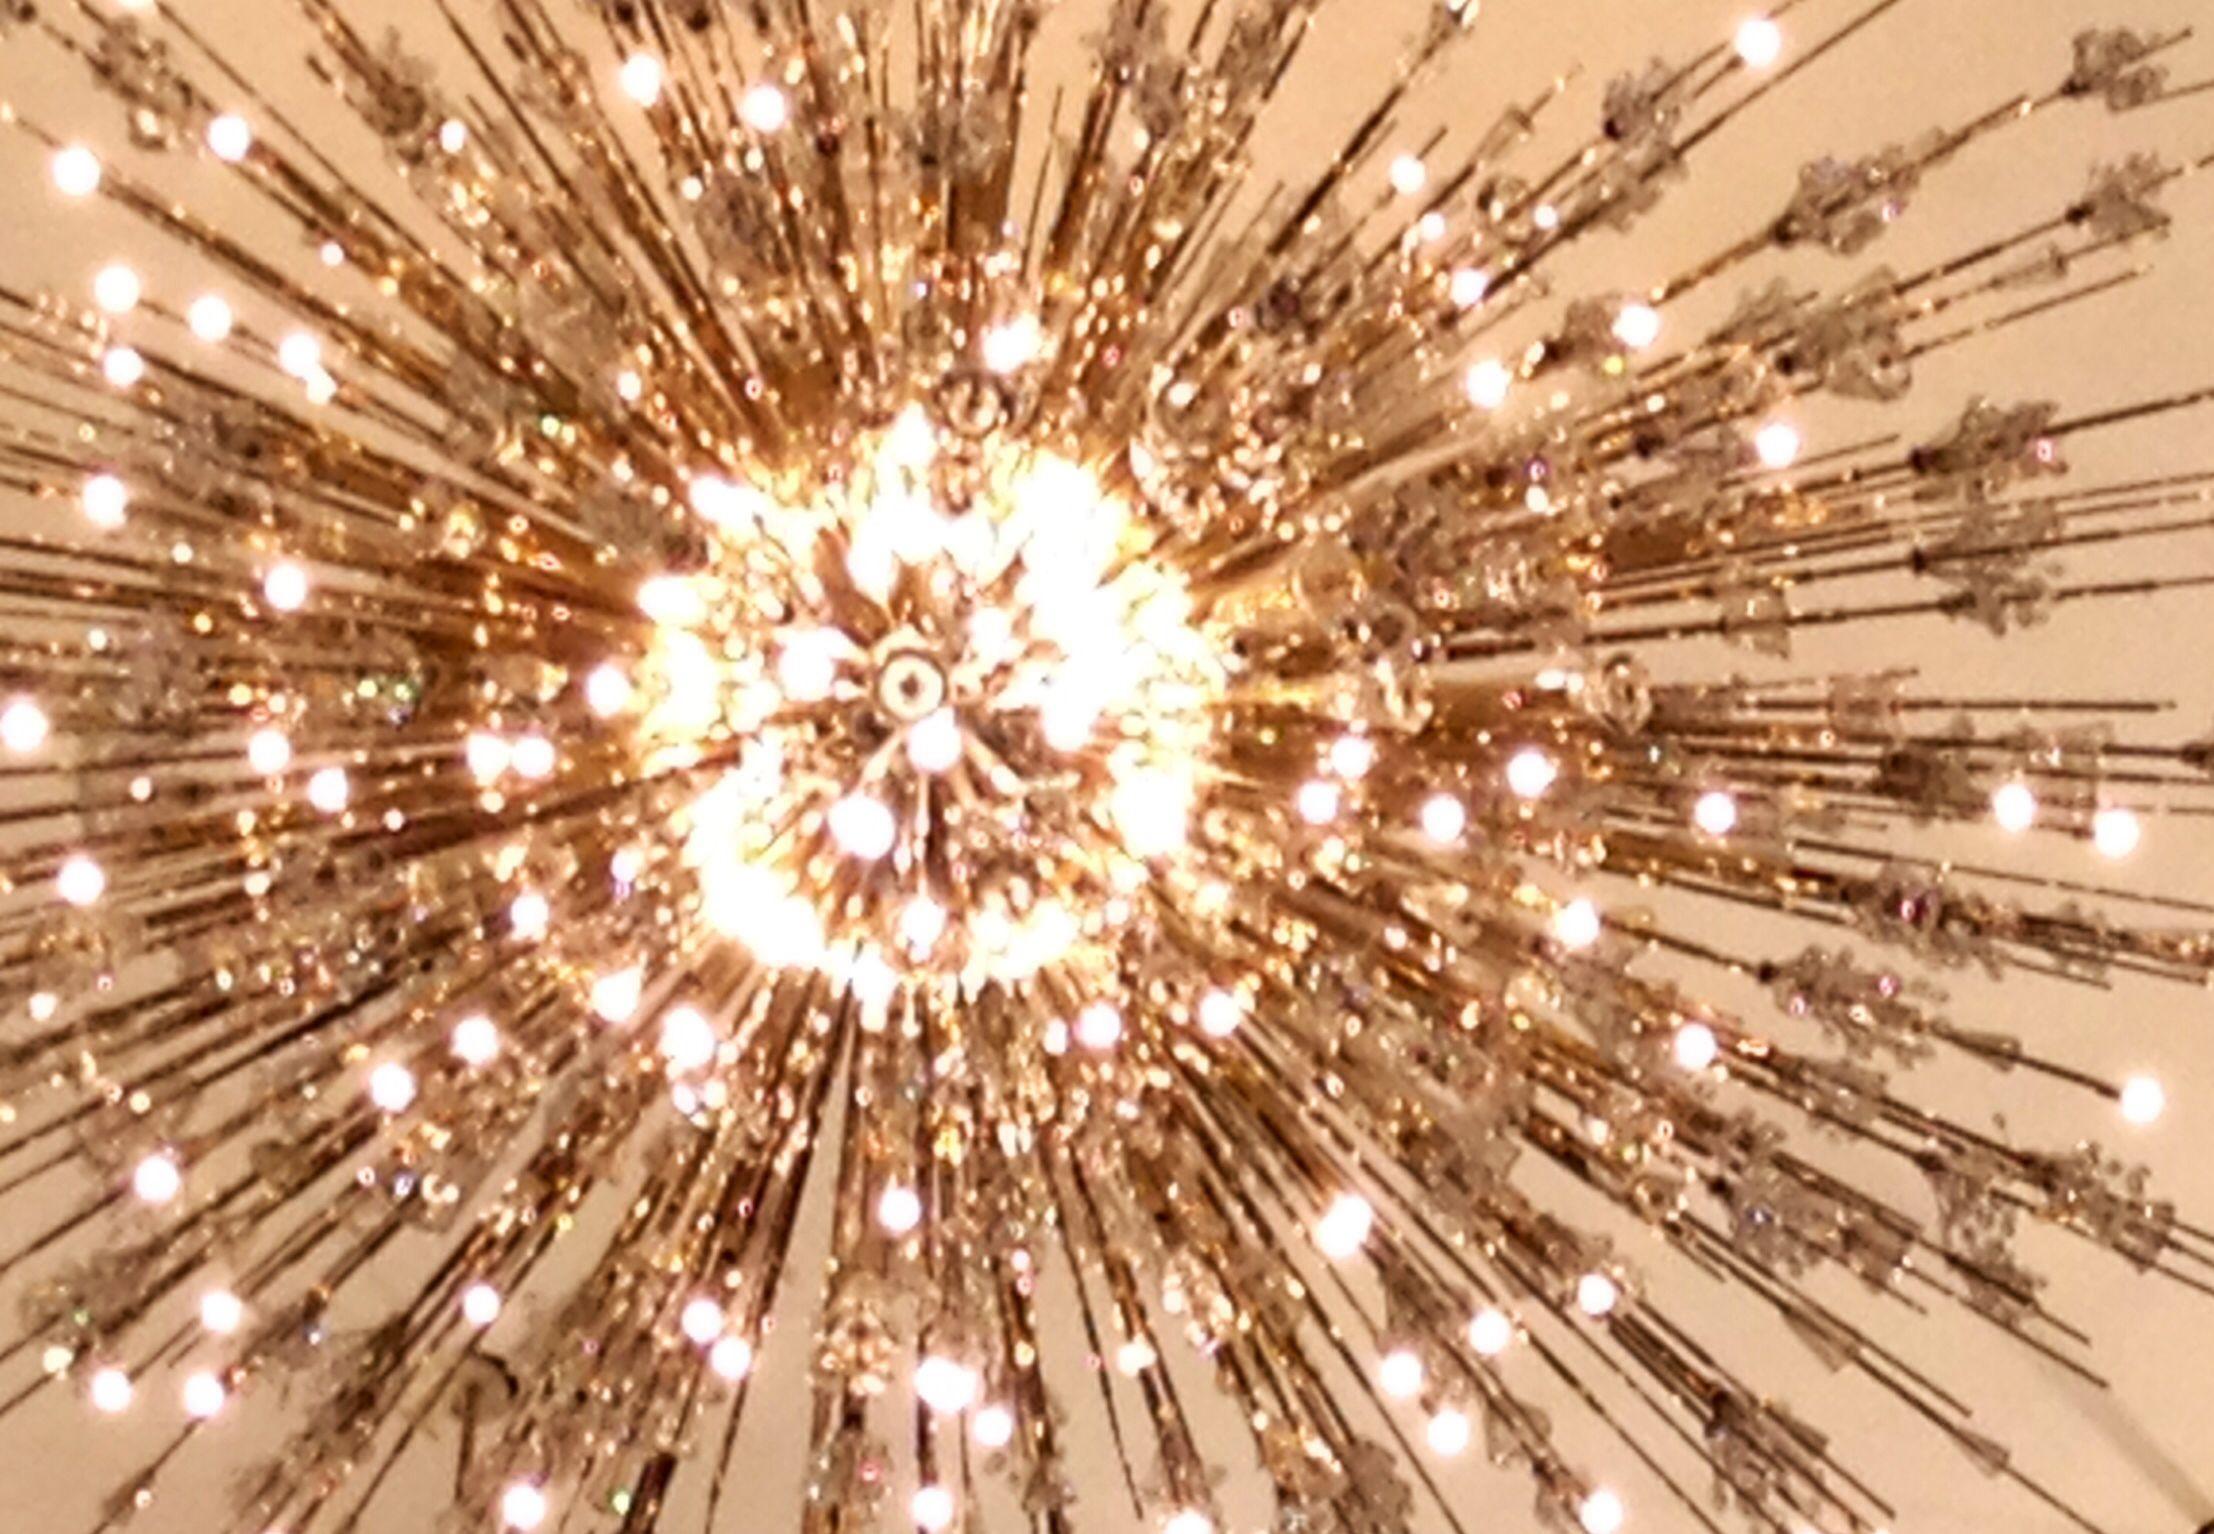 Sputnik chandelier at the Metropolitan Opera in NYC Recently